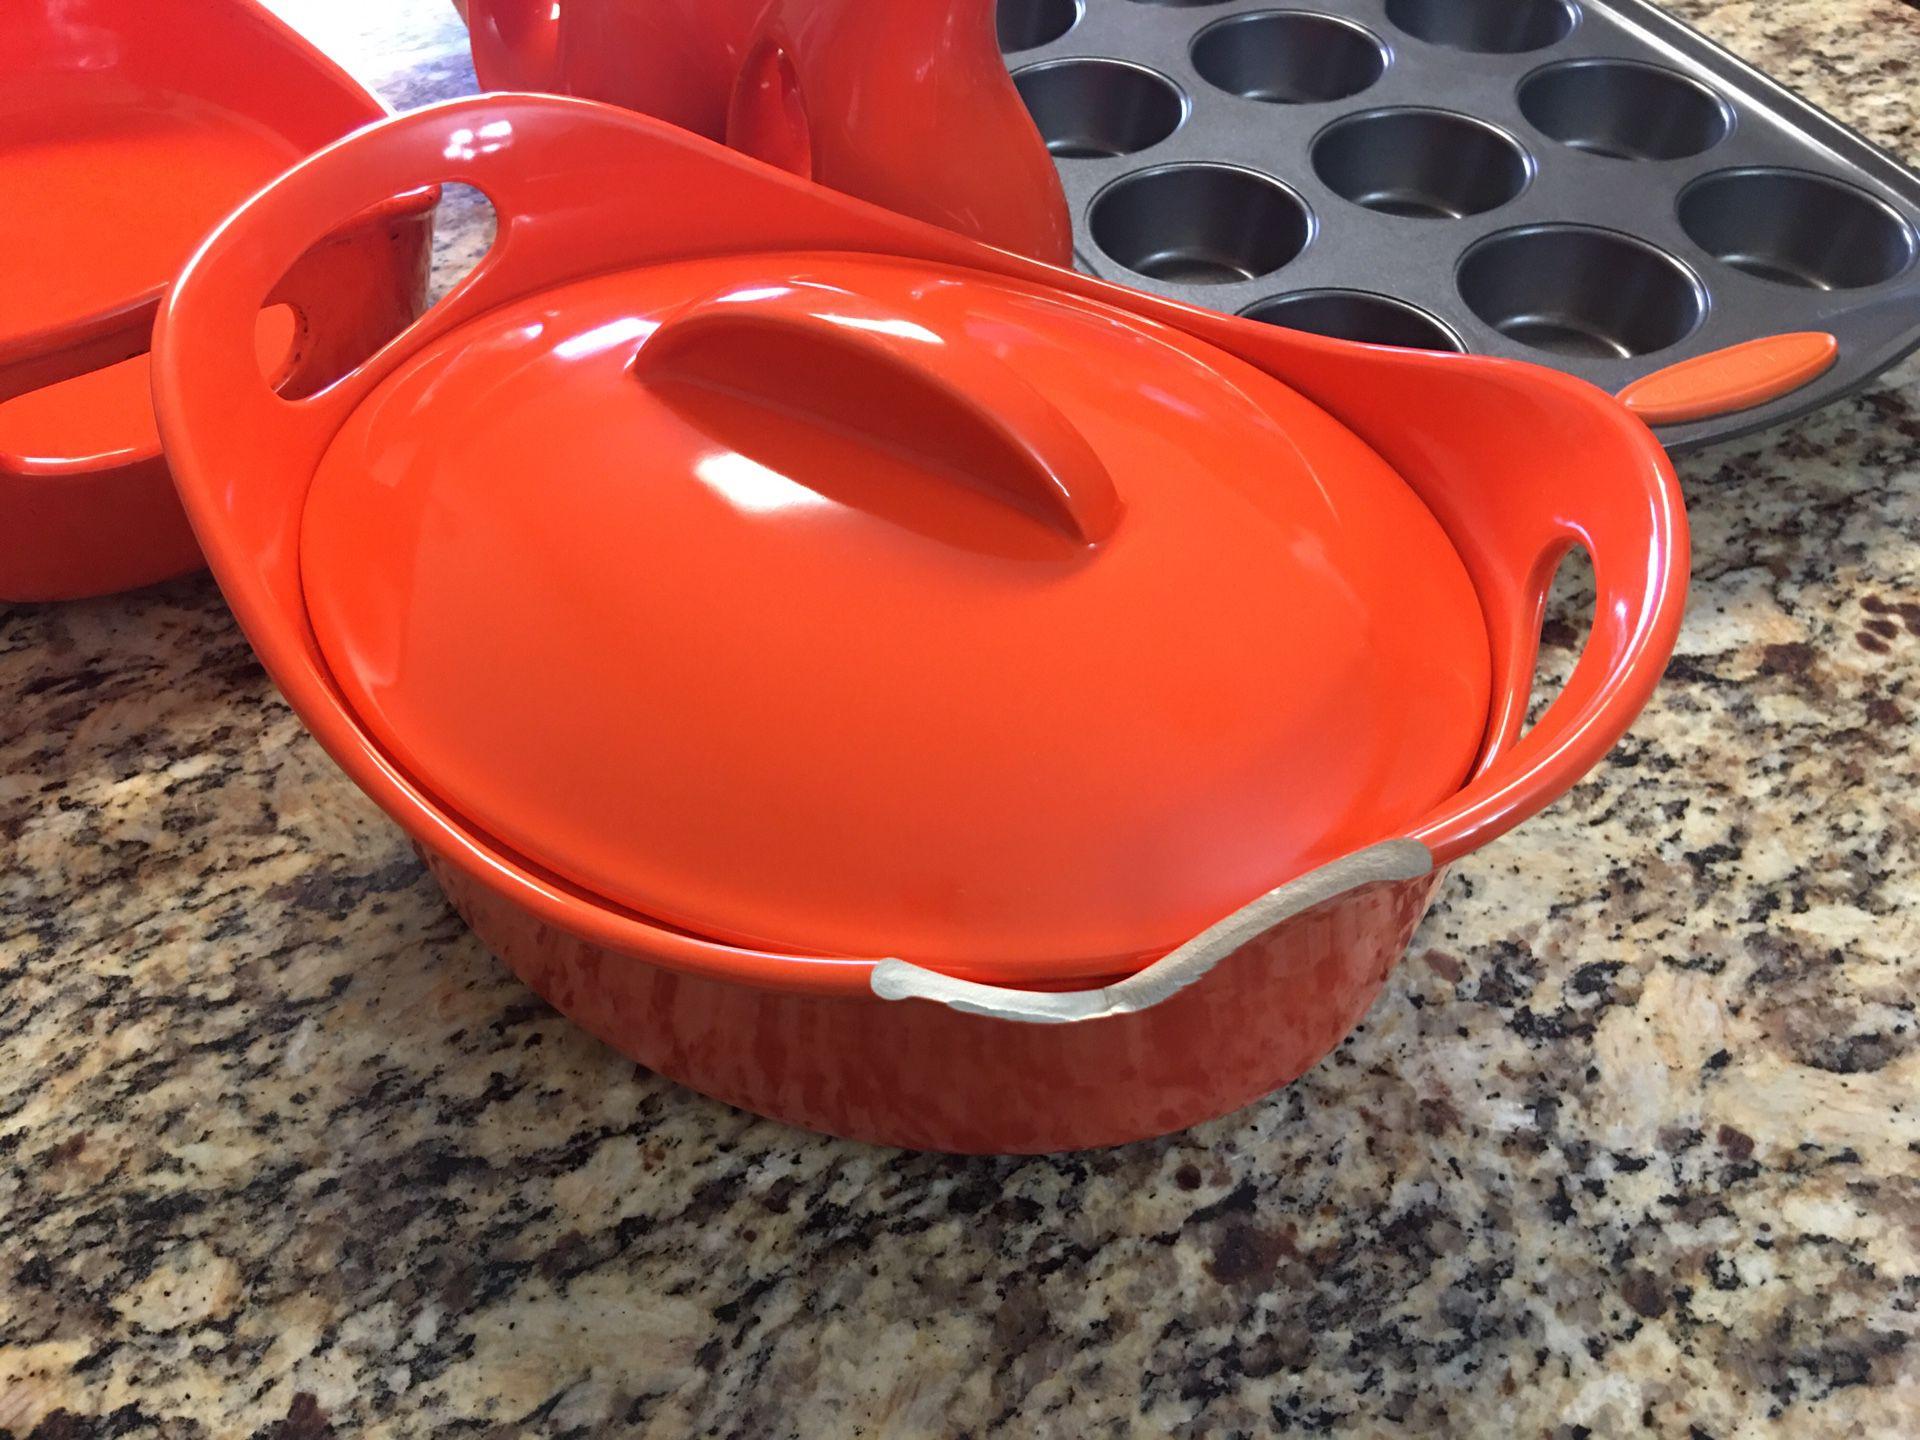 Rachel Ray Bakeware | Casserole dishes, Non-Stick Muffin Sheet Pan, & EVOO and Vinegar Bottle Set